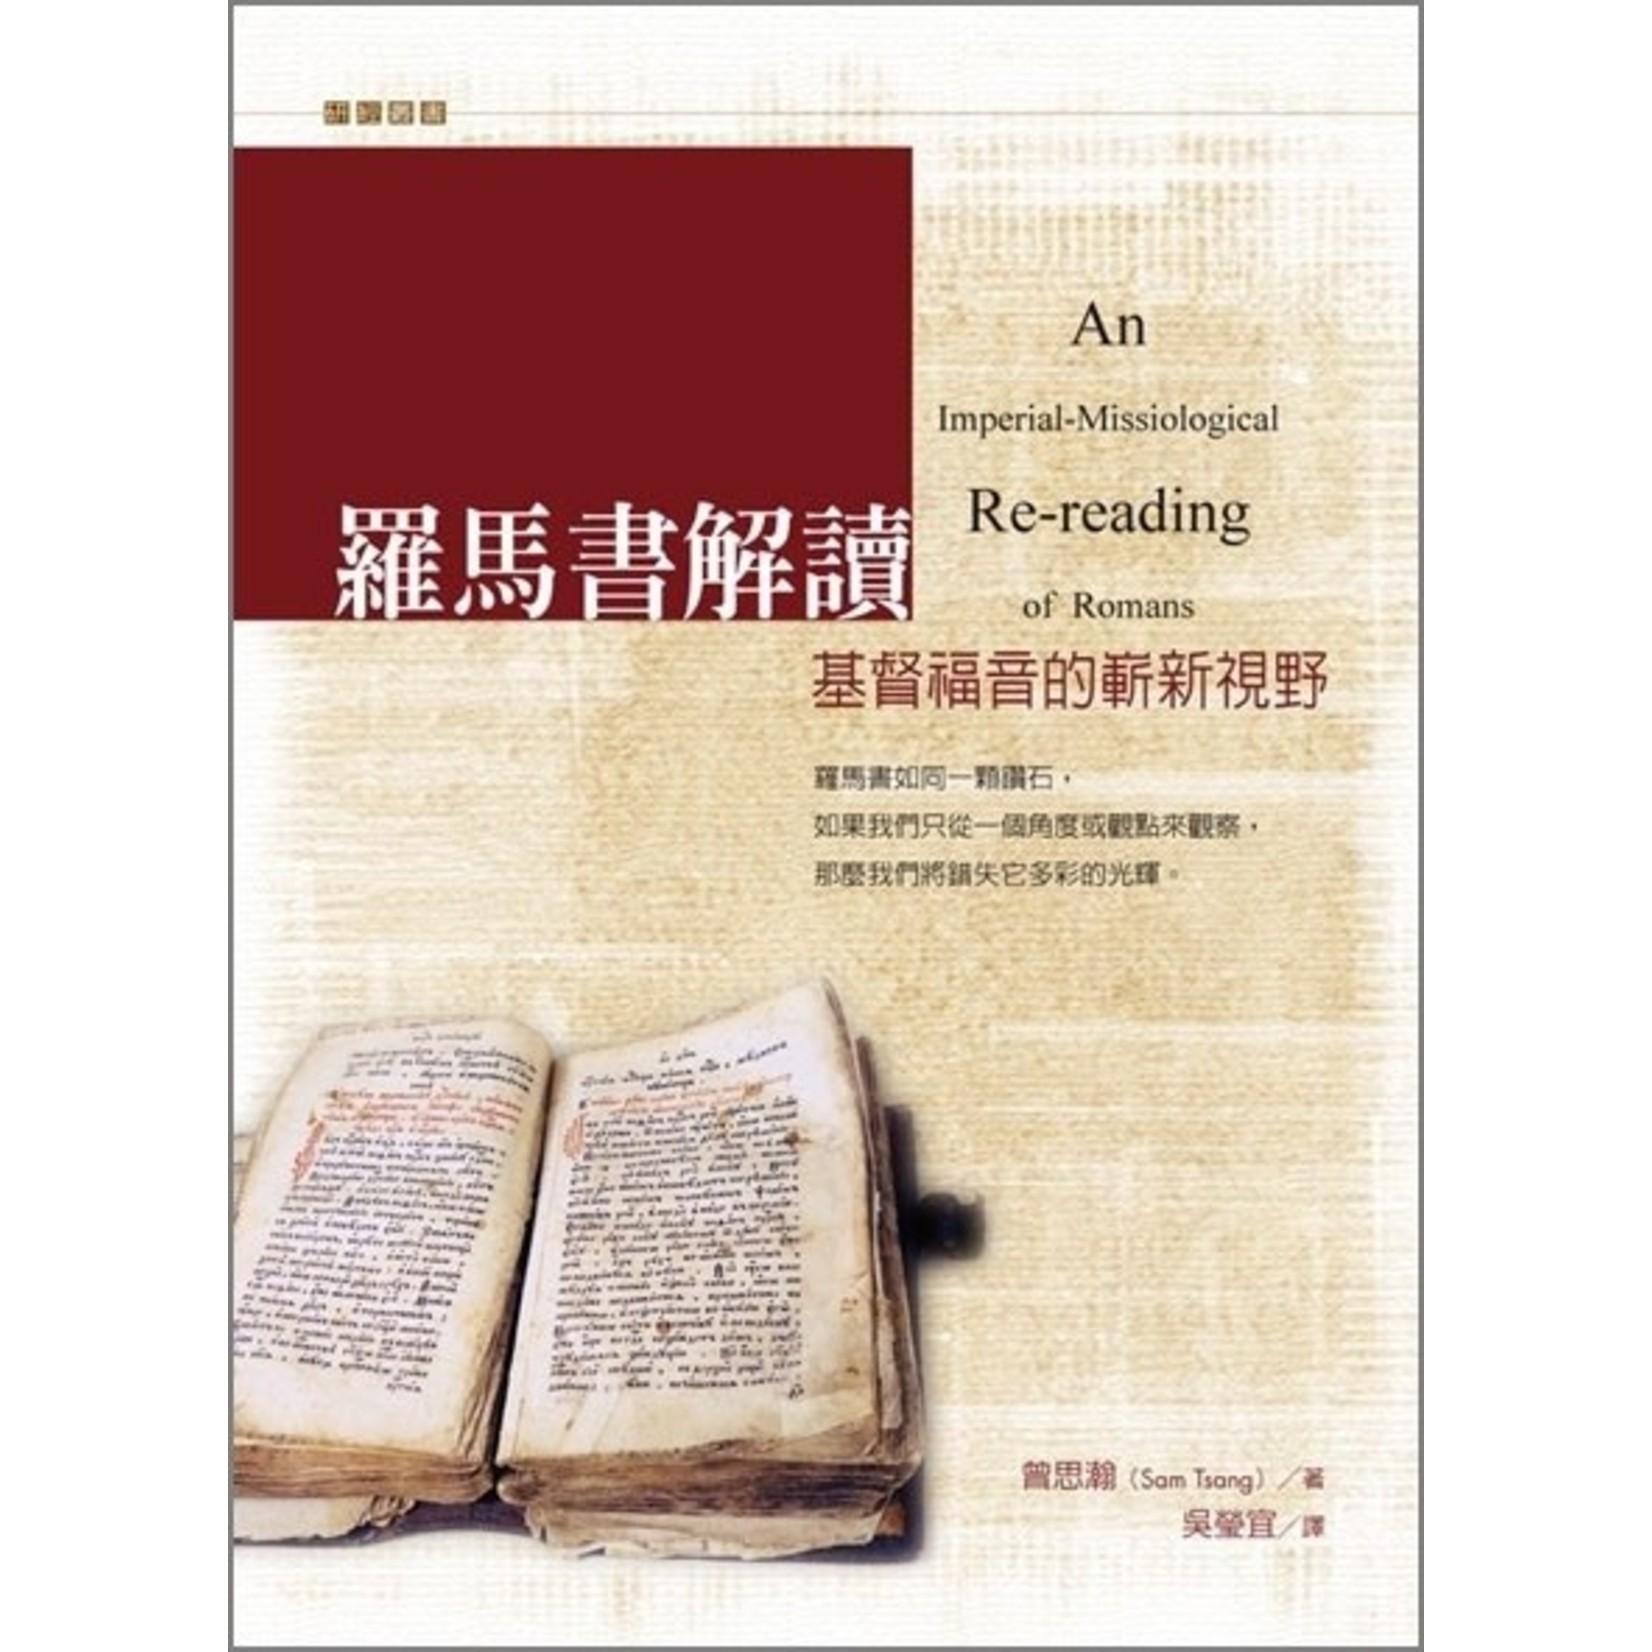 校園書房 Campus Books 羅馬書解讀:基督福音的嶄新視野 An Imperial-Missiological Re-reading of Romans